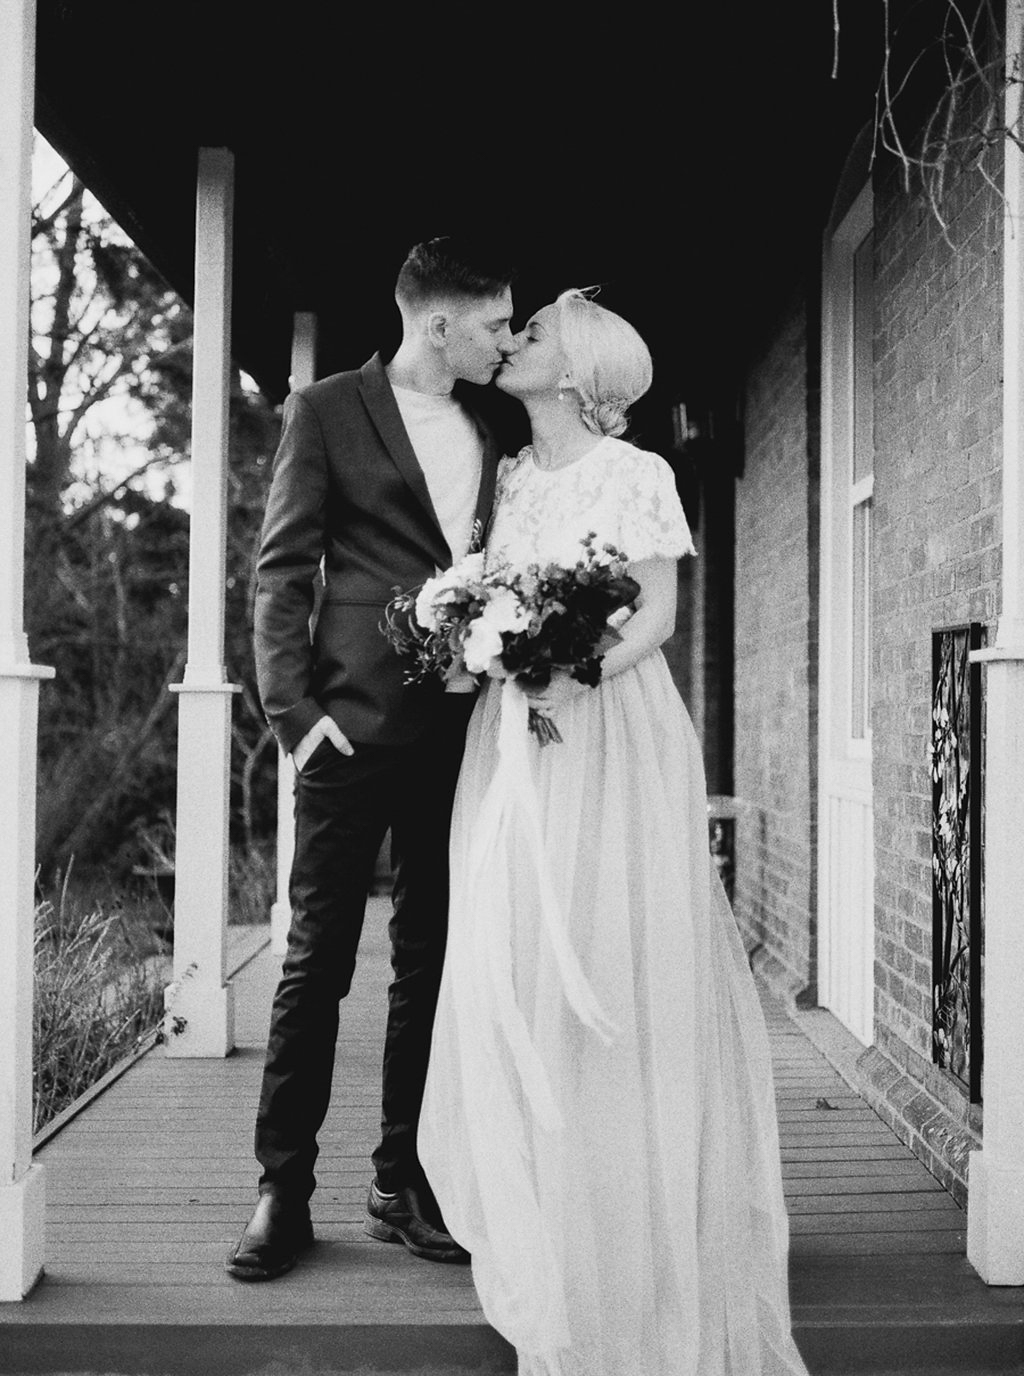 kayla-yestal-photography-vineyard-bride-swish-list-beamer-falls-manor-grimsby-engagement-24.jpg